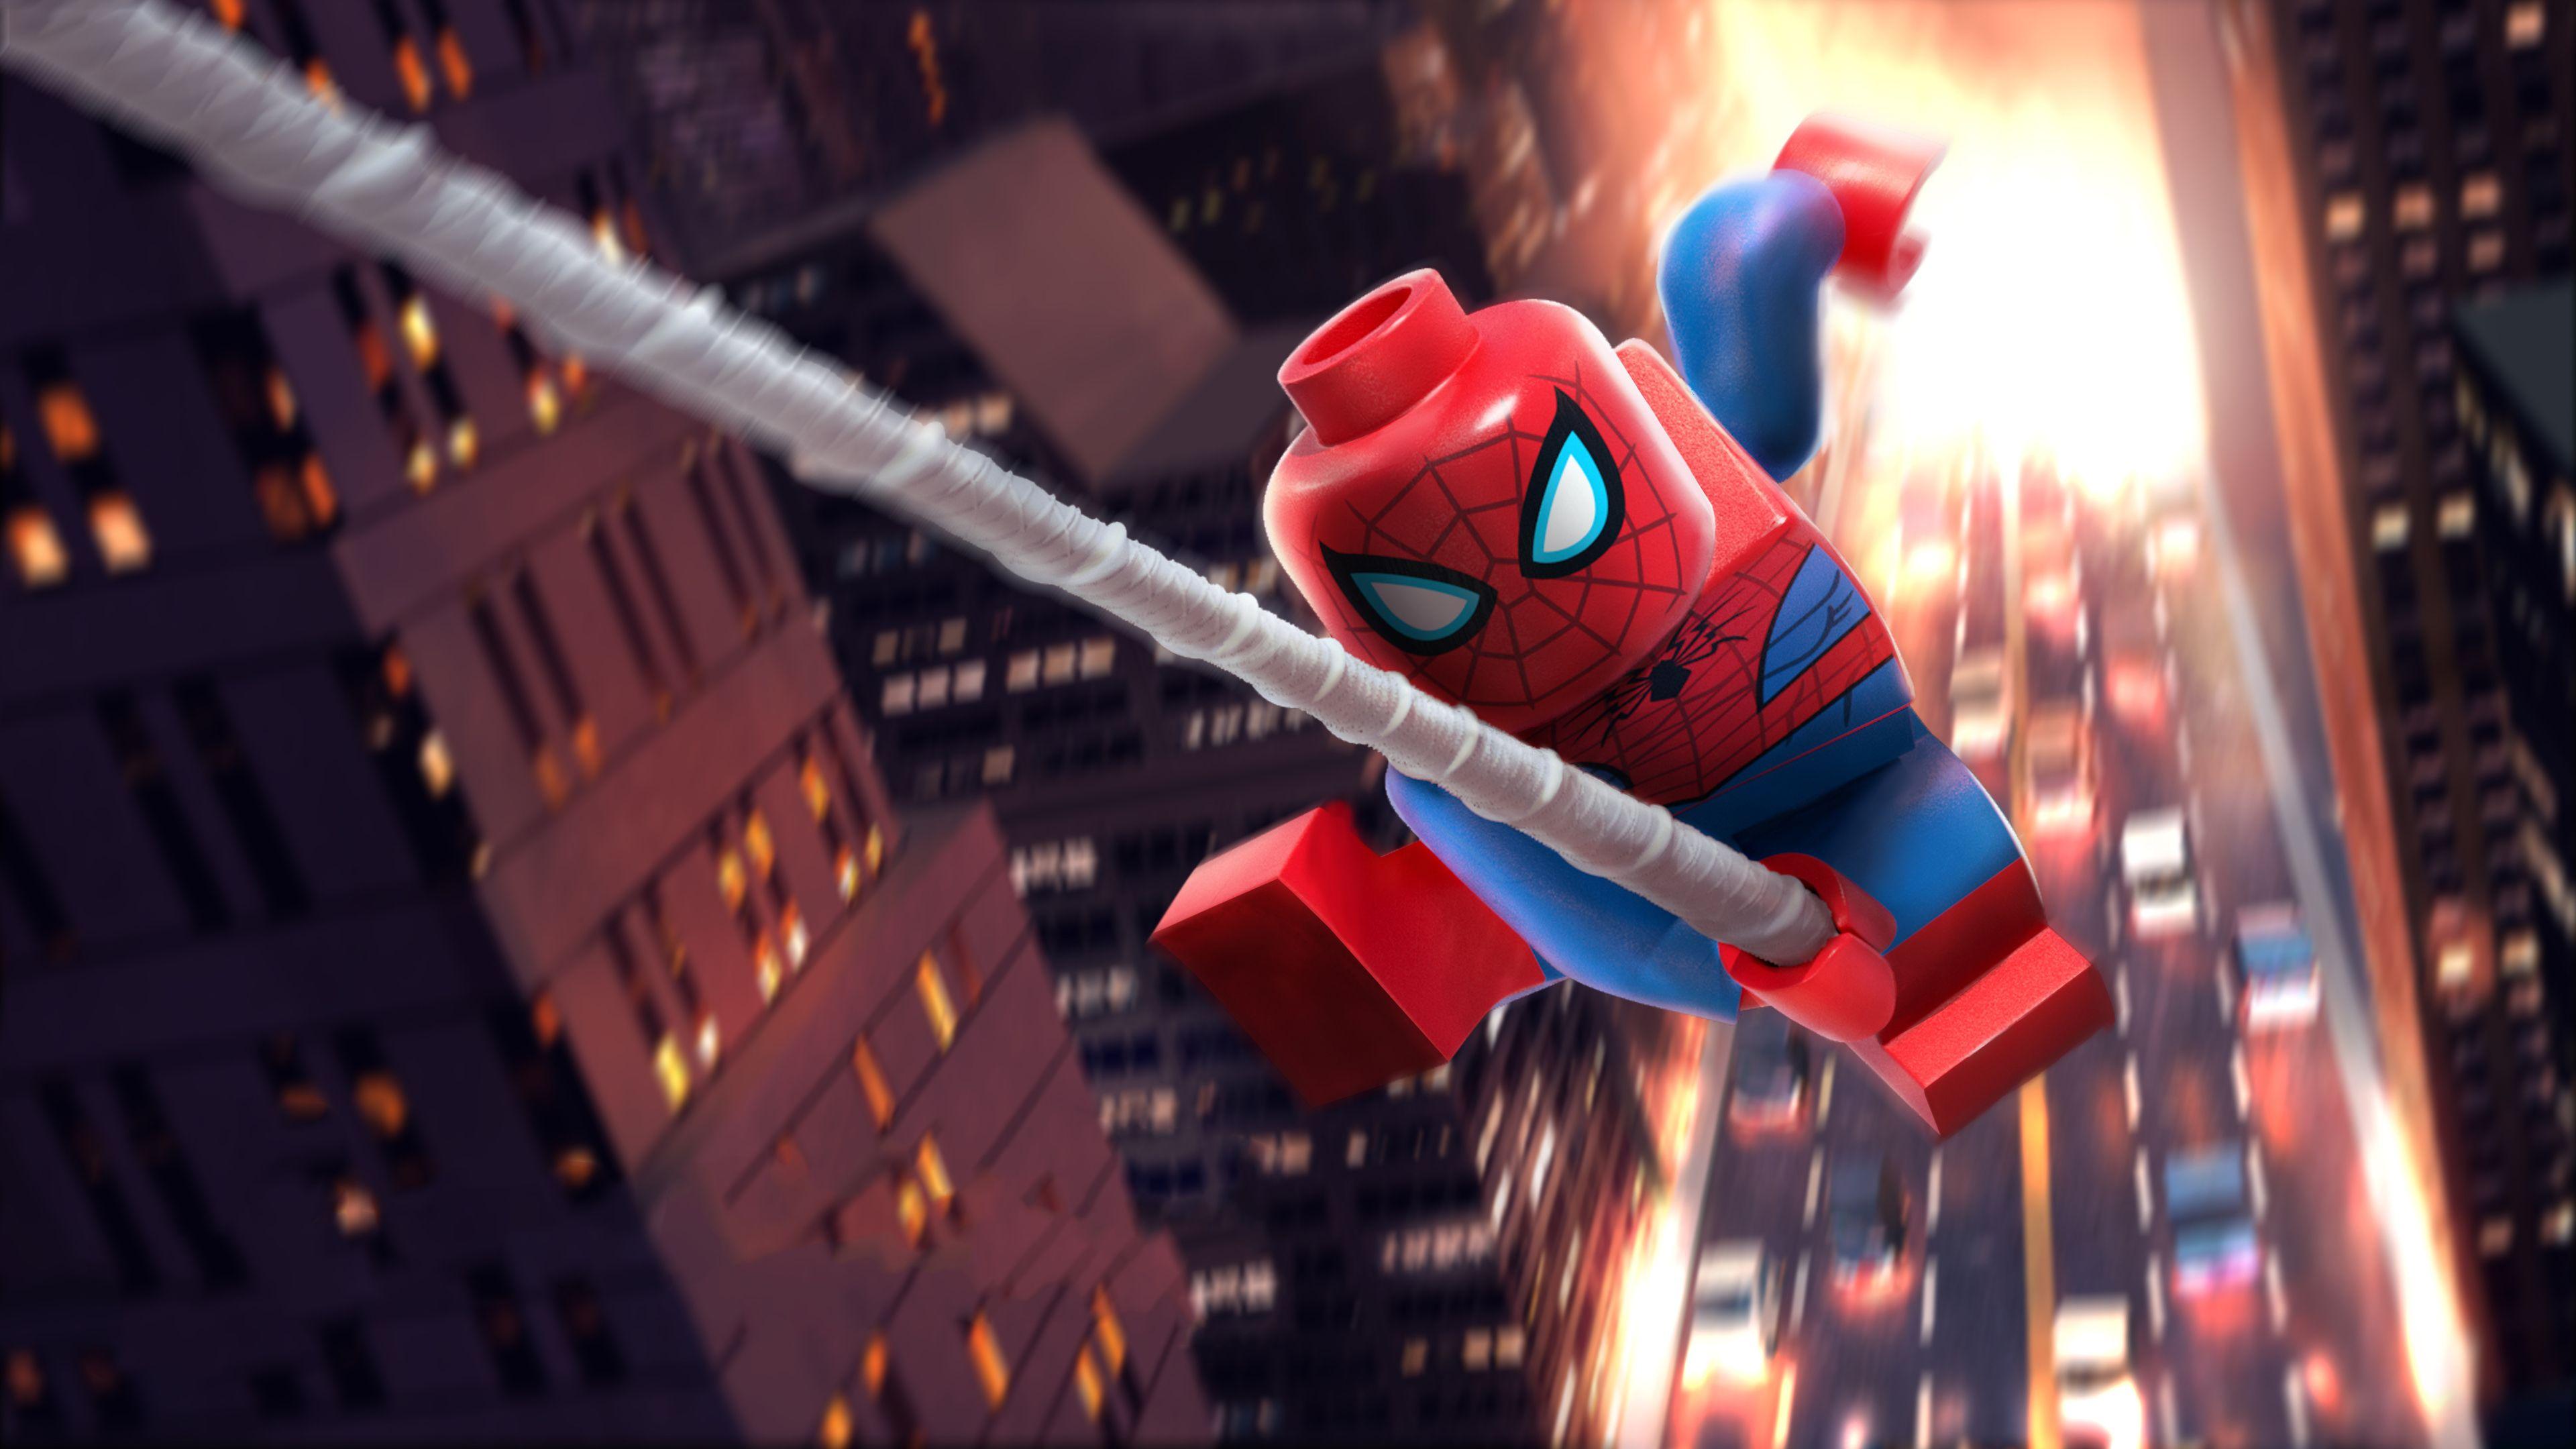 Lego Spiderman 5k Superheroes Wallpapers Spiderman Wallpapers Lego